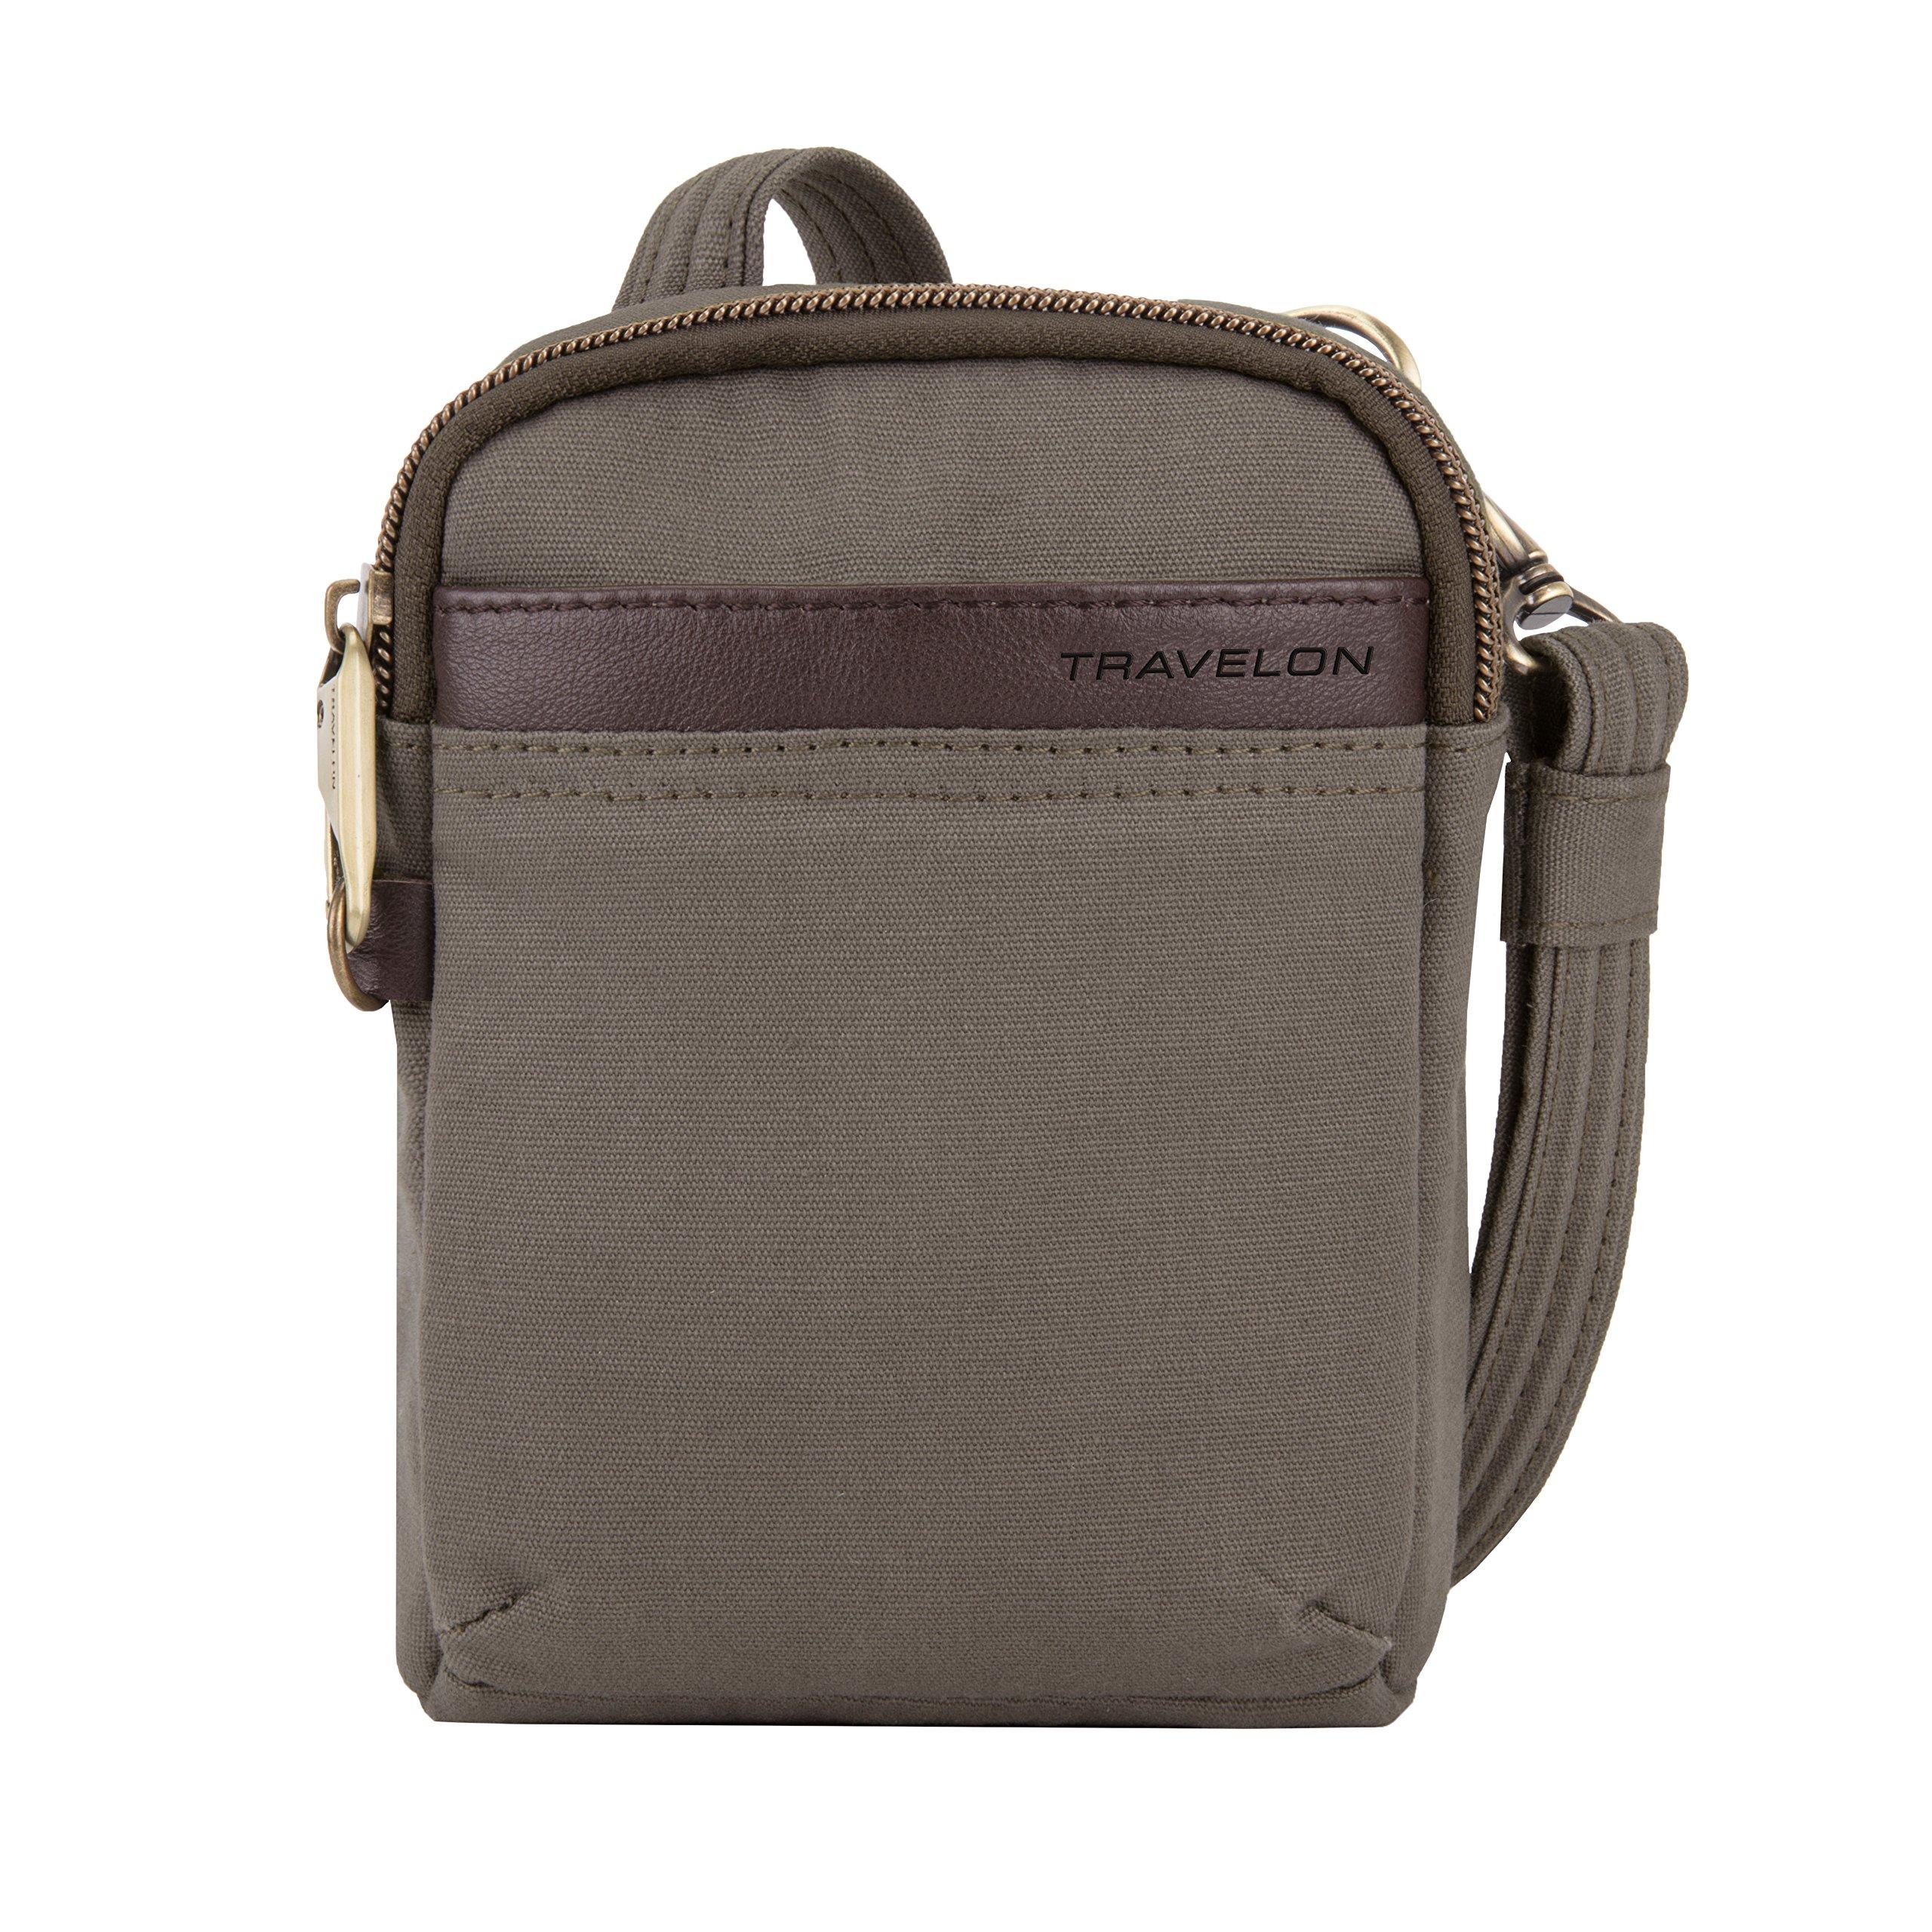 Travelon Anti-Theft Courier Mini Crossbody Cross Body Bag, Stone Gray, One Size